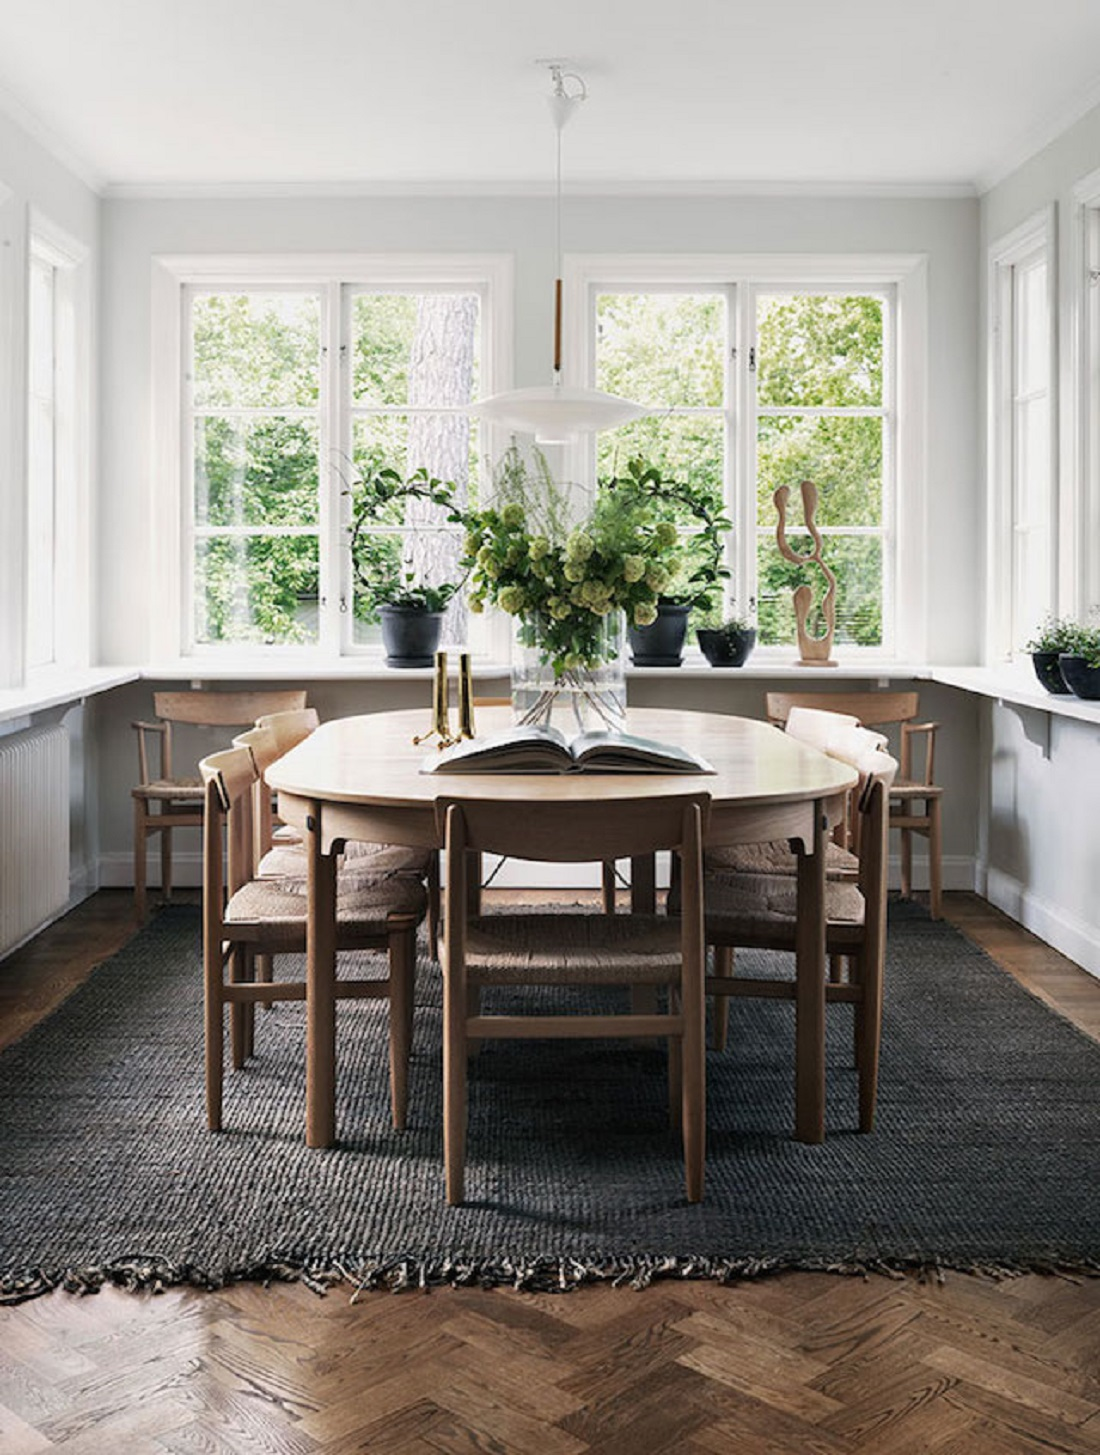 @projectfairytale: A Scandinavian Home